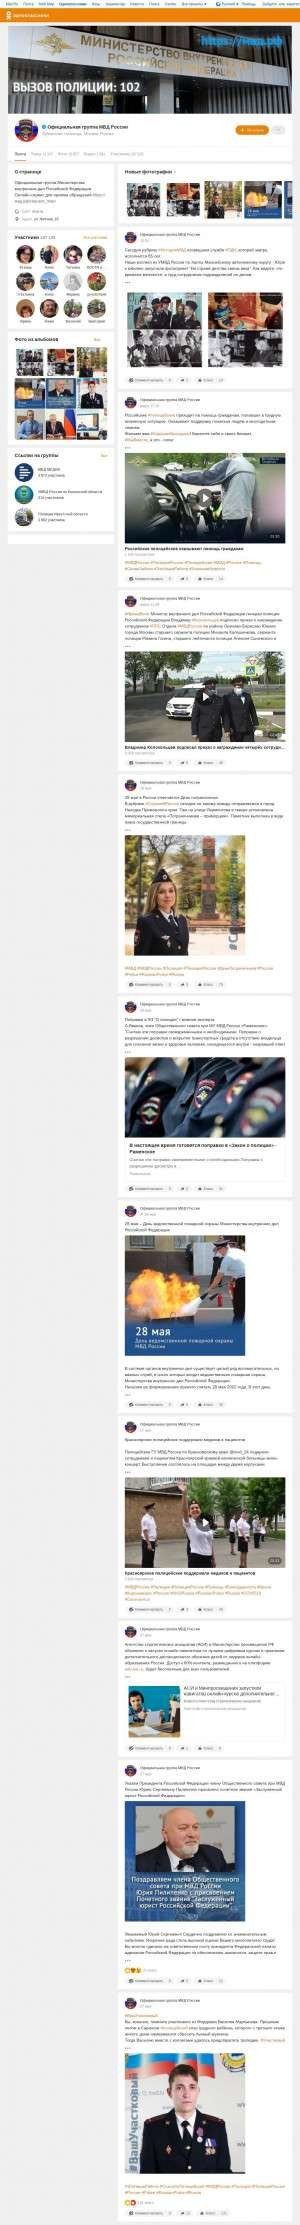 Предпросмотр для www.odnoklassniki.ru — Отдел полиции № 1